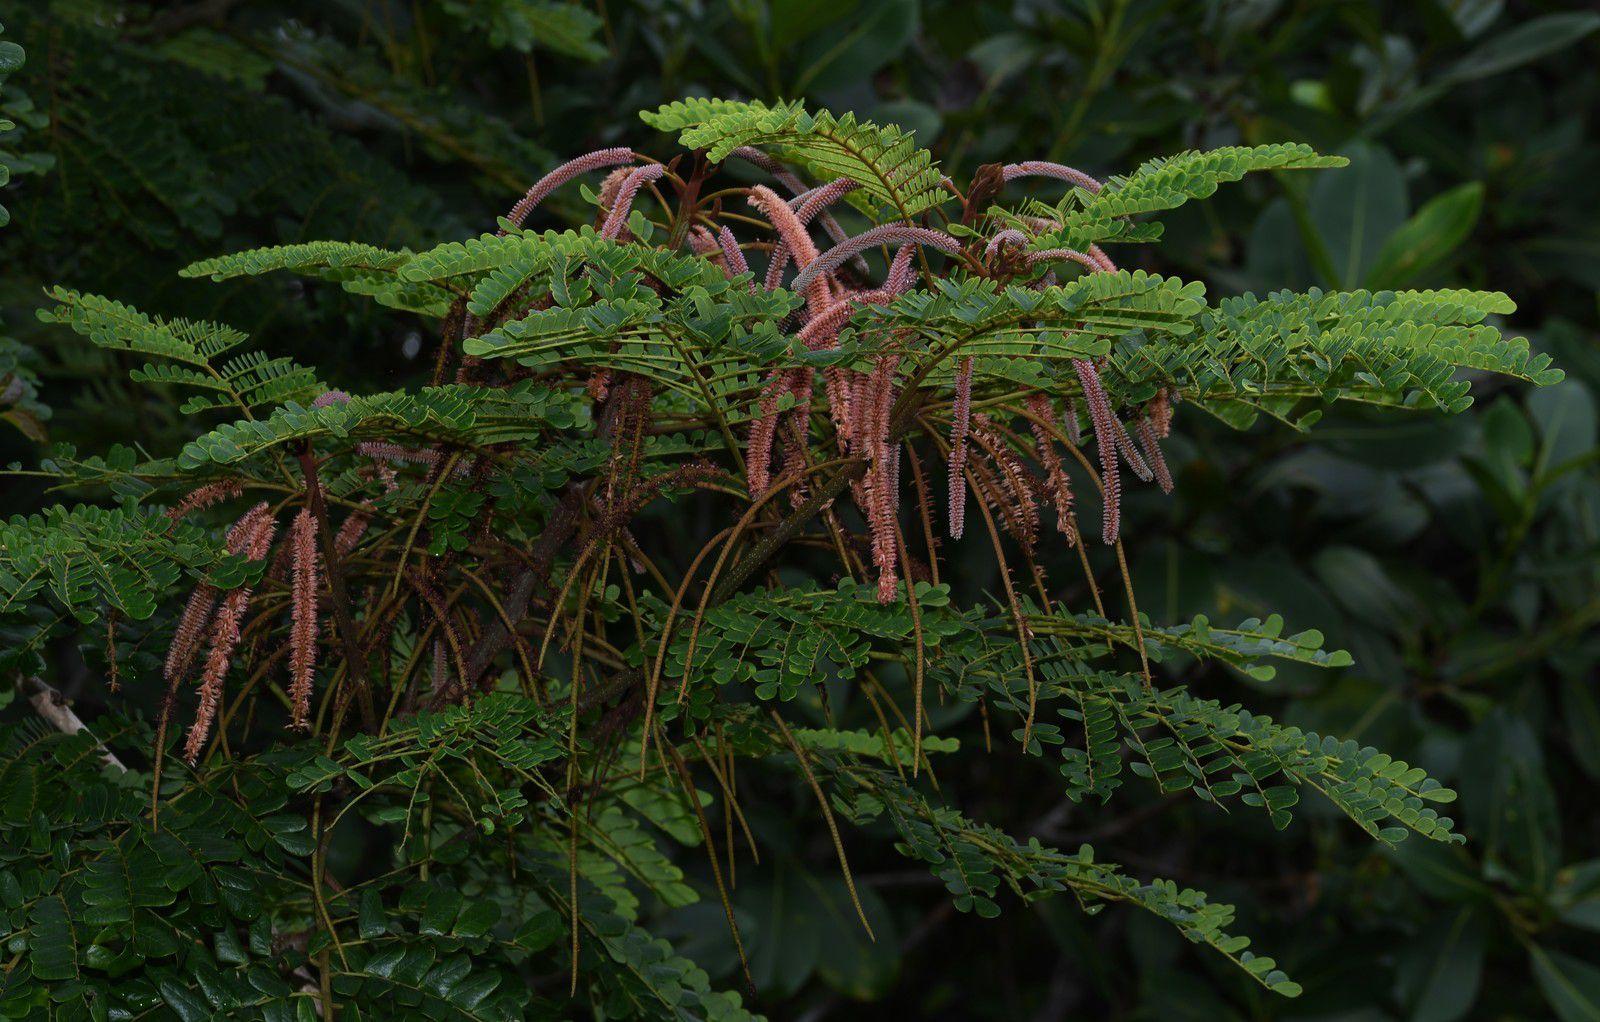 Stryphnodendron guianense